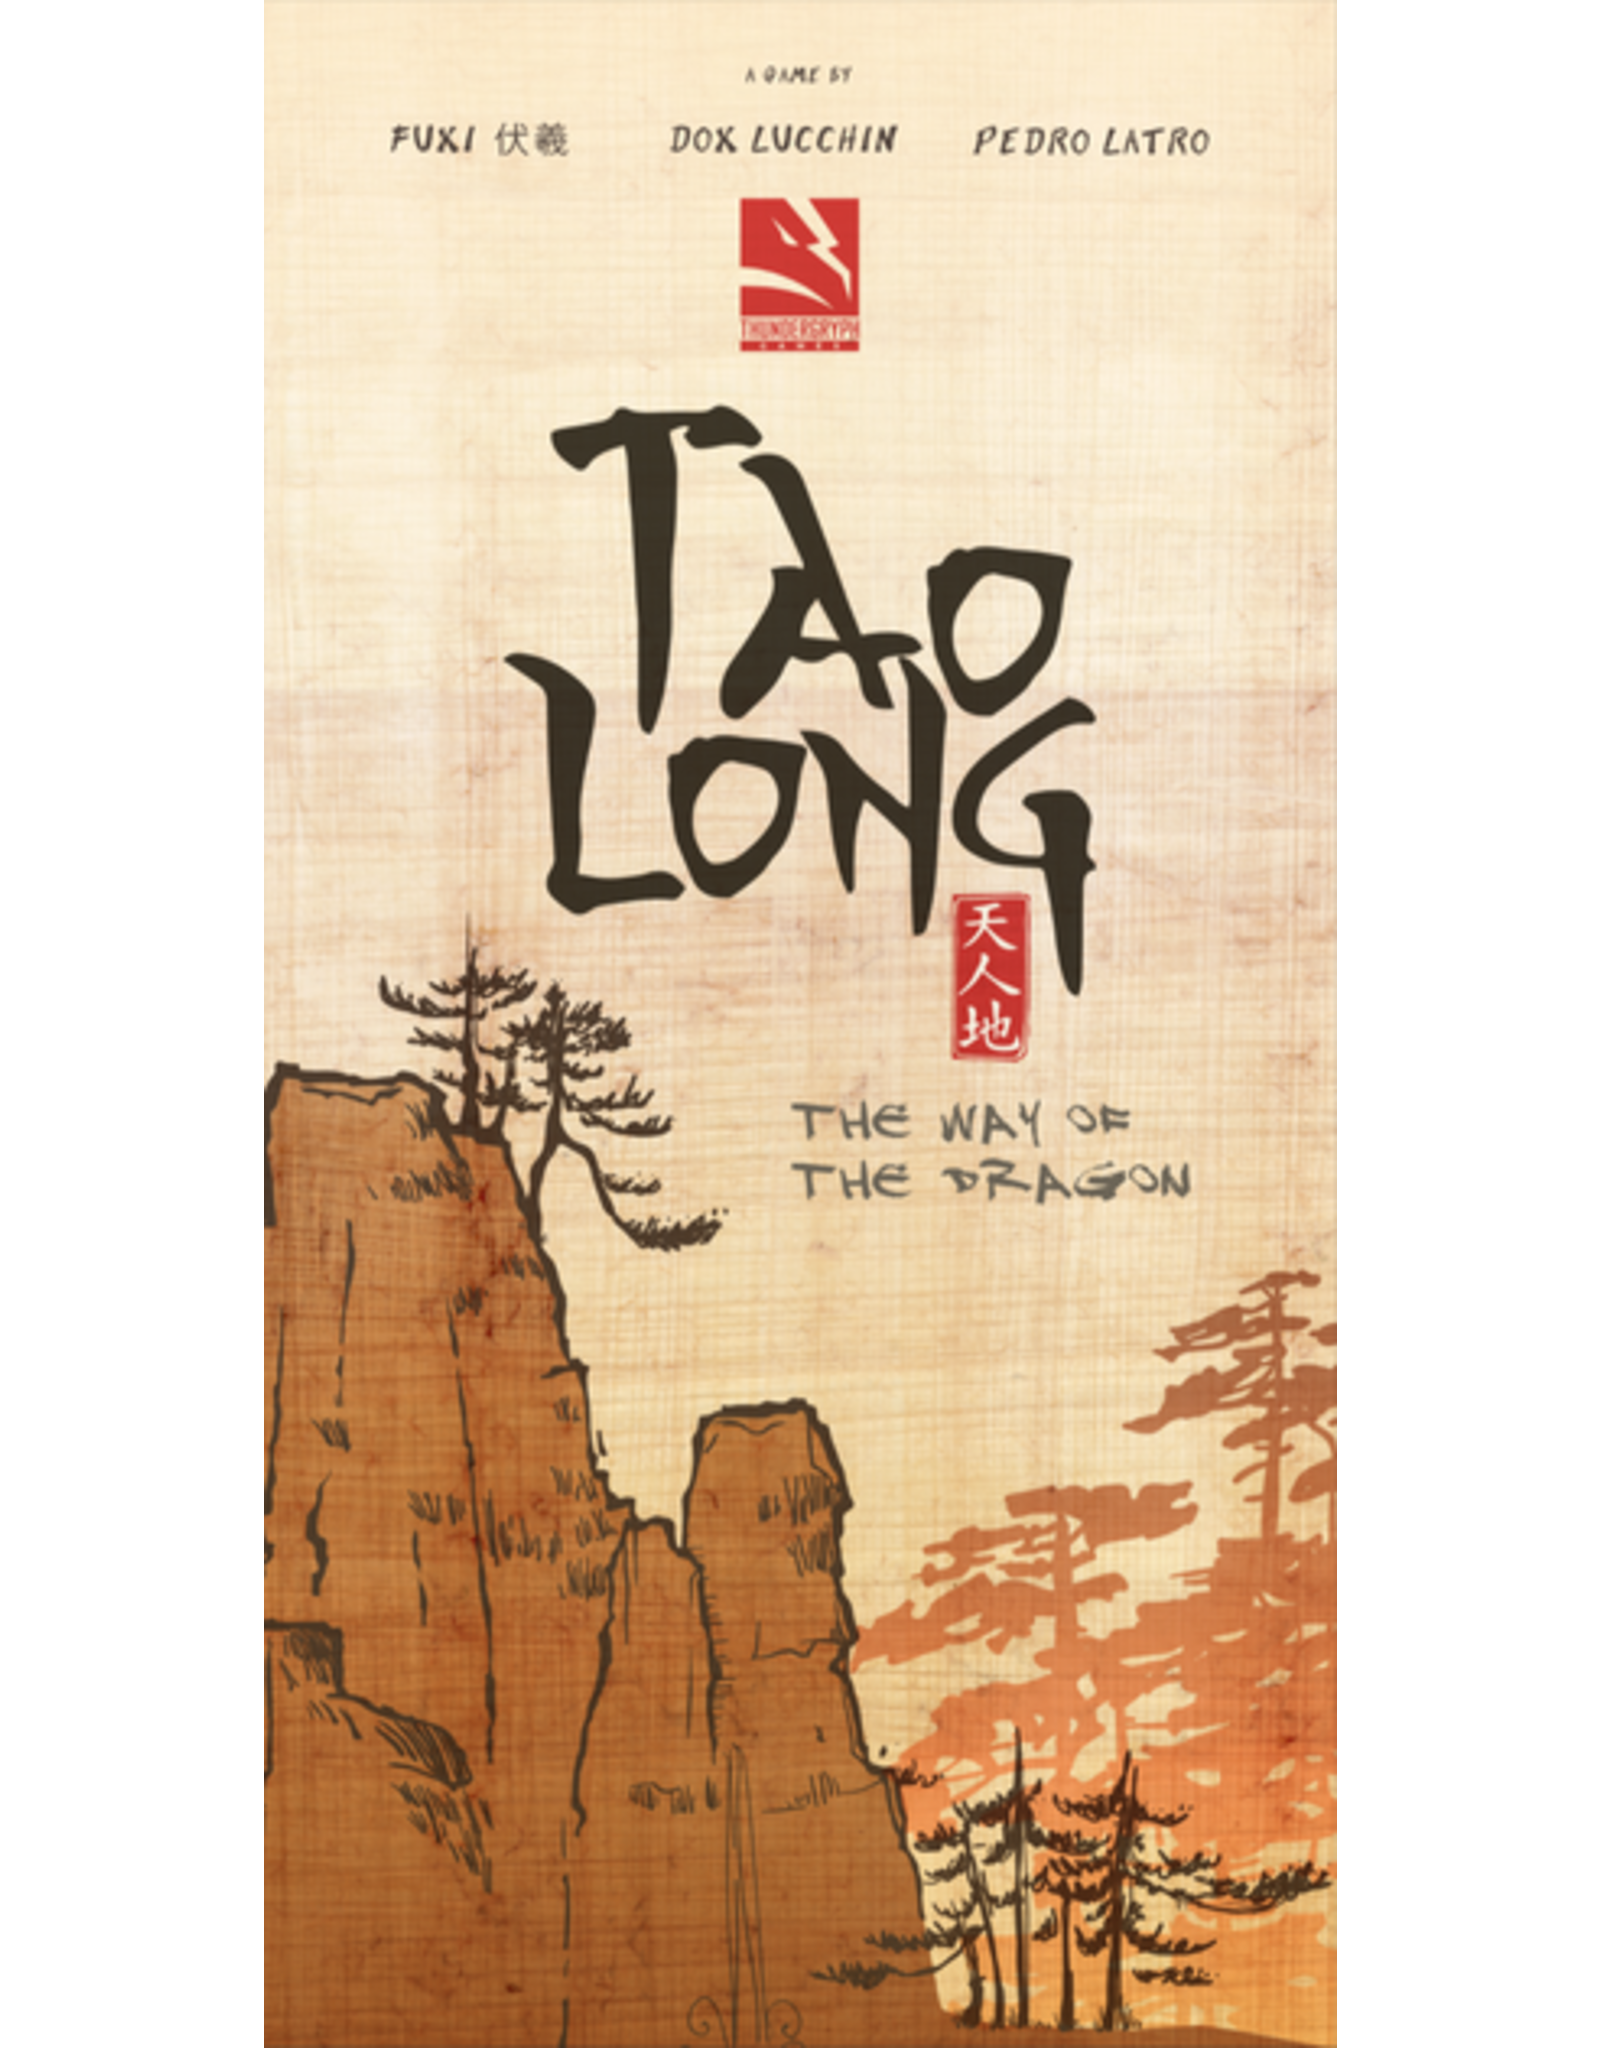 Tao Long: Way of the Dragon